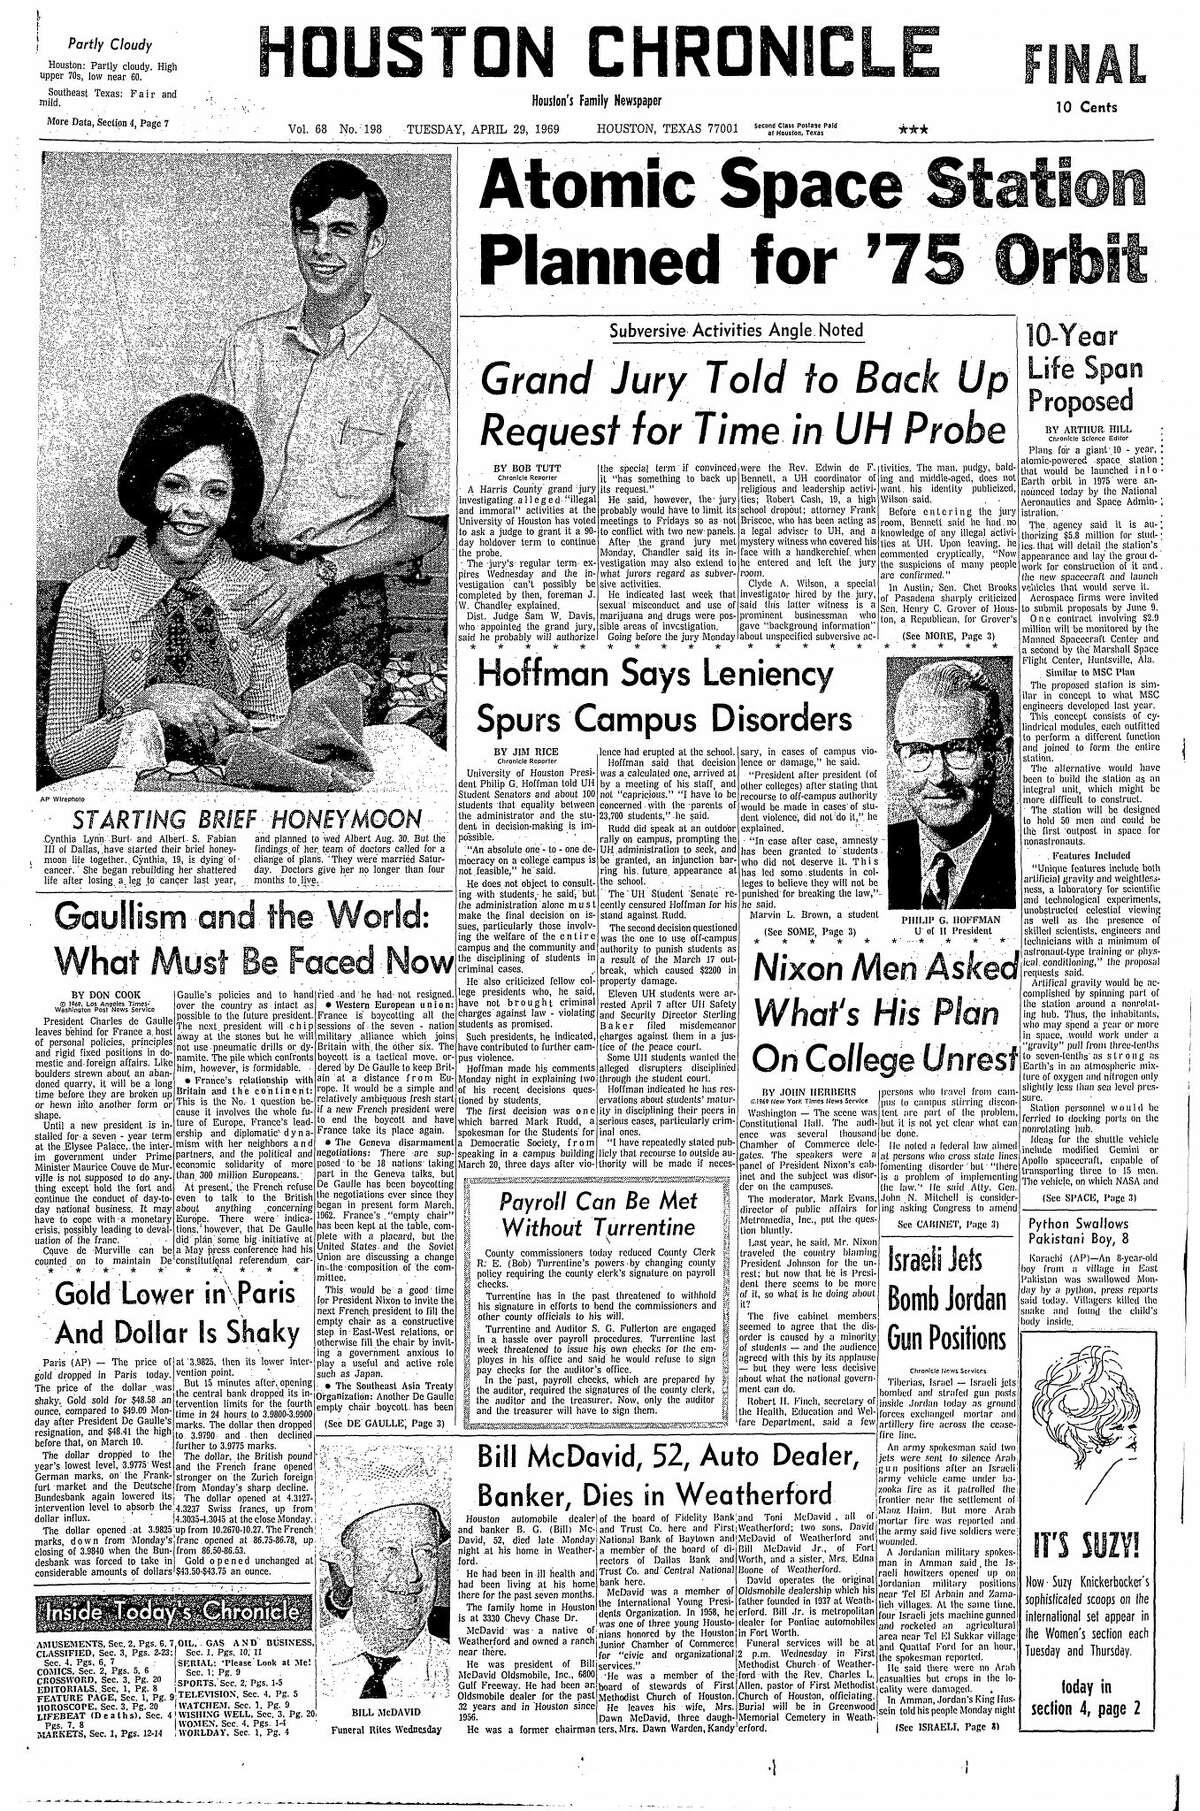 April 29, 1969